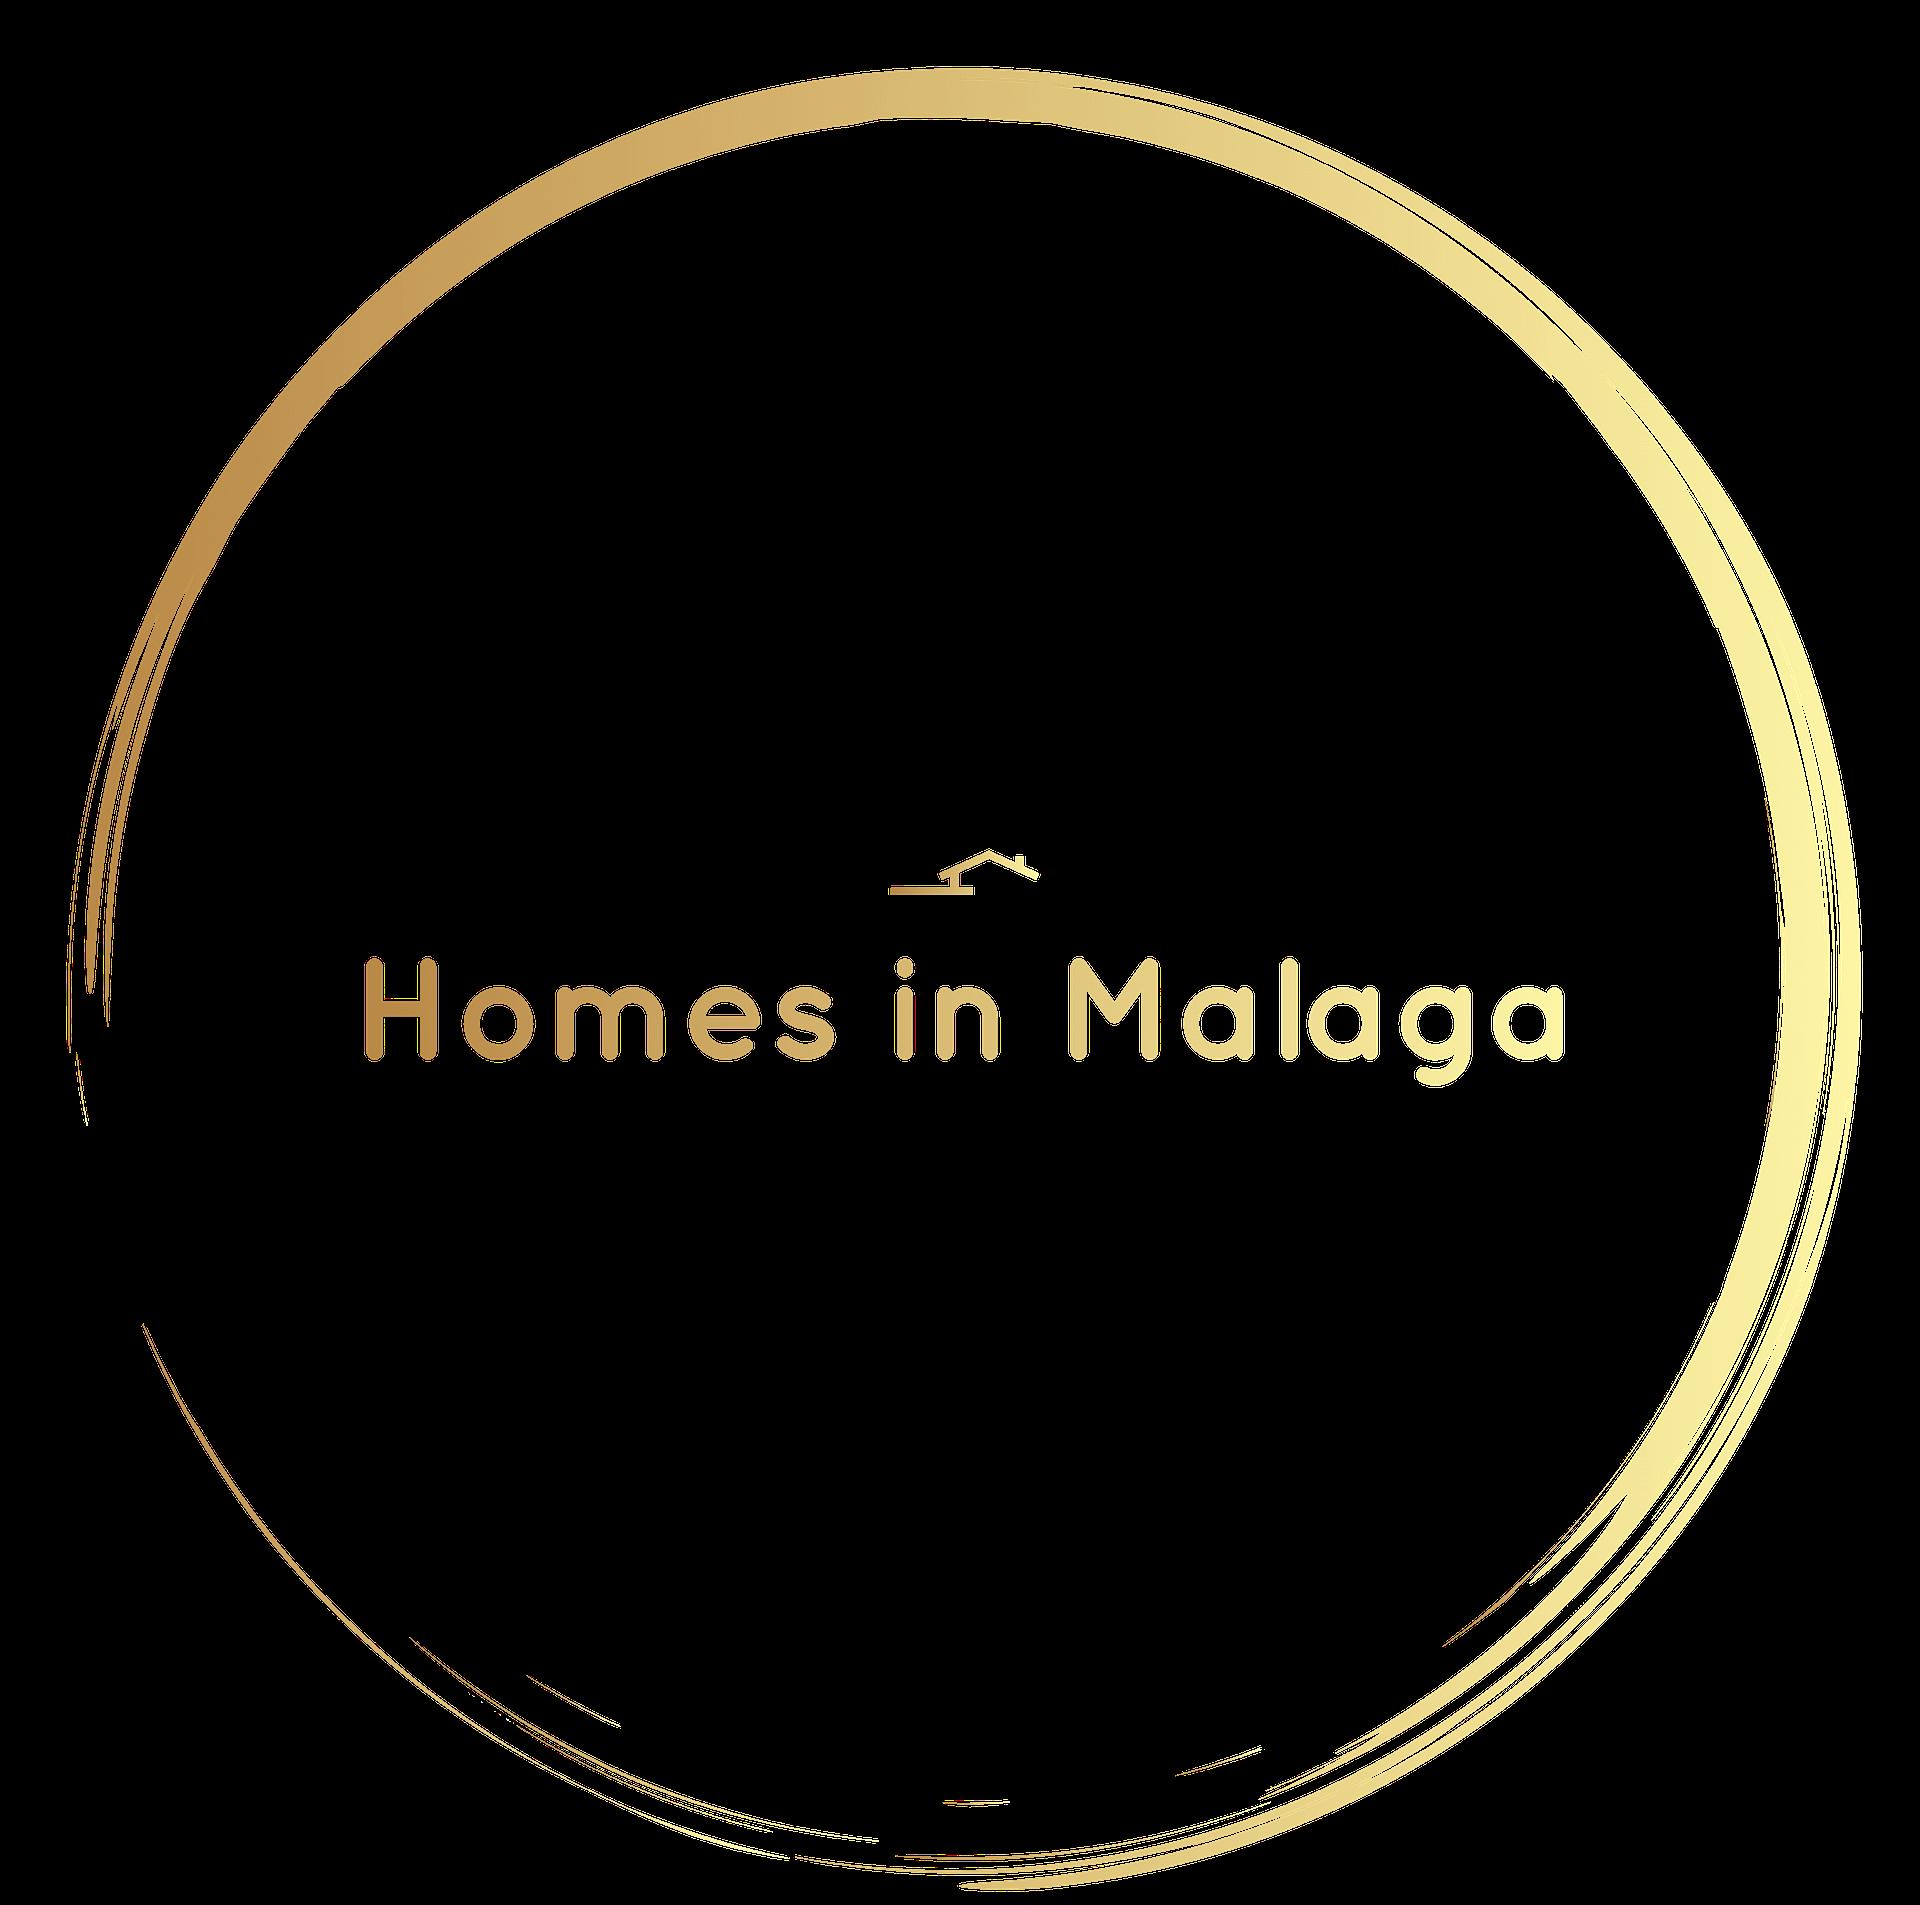 Homes in Malaga